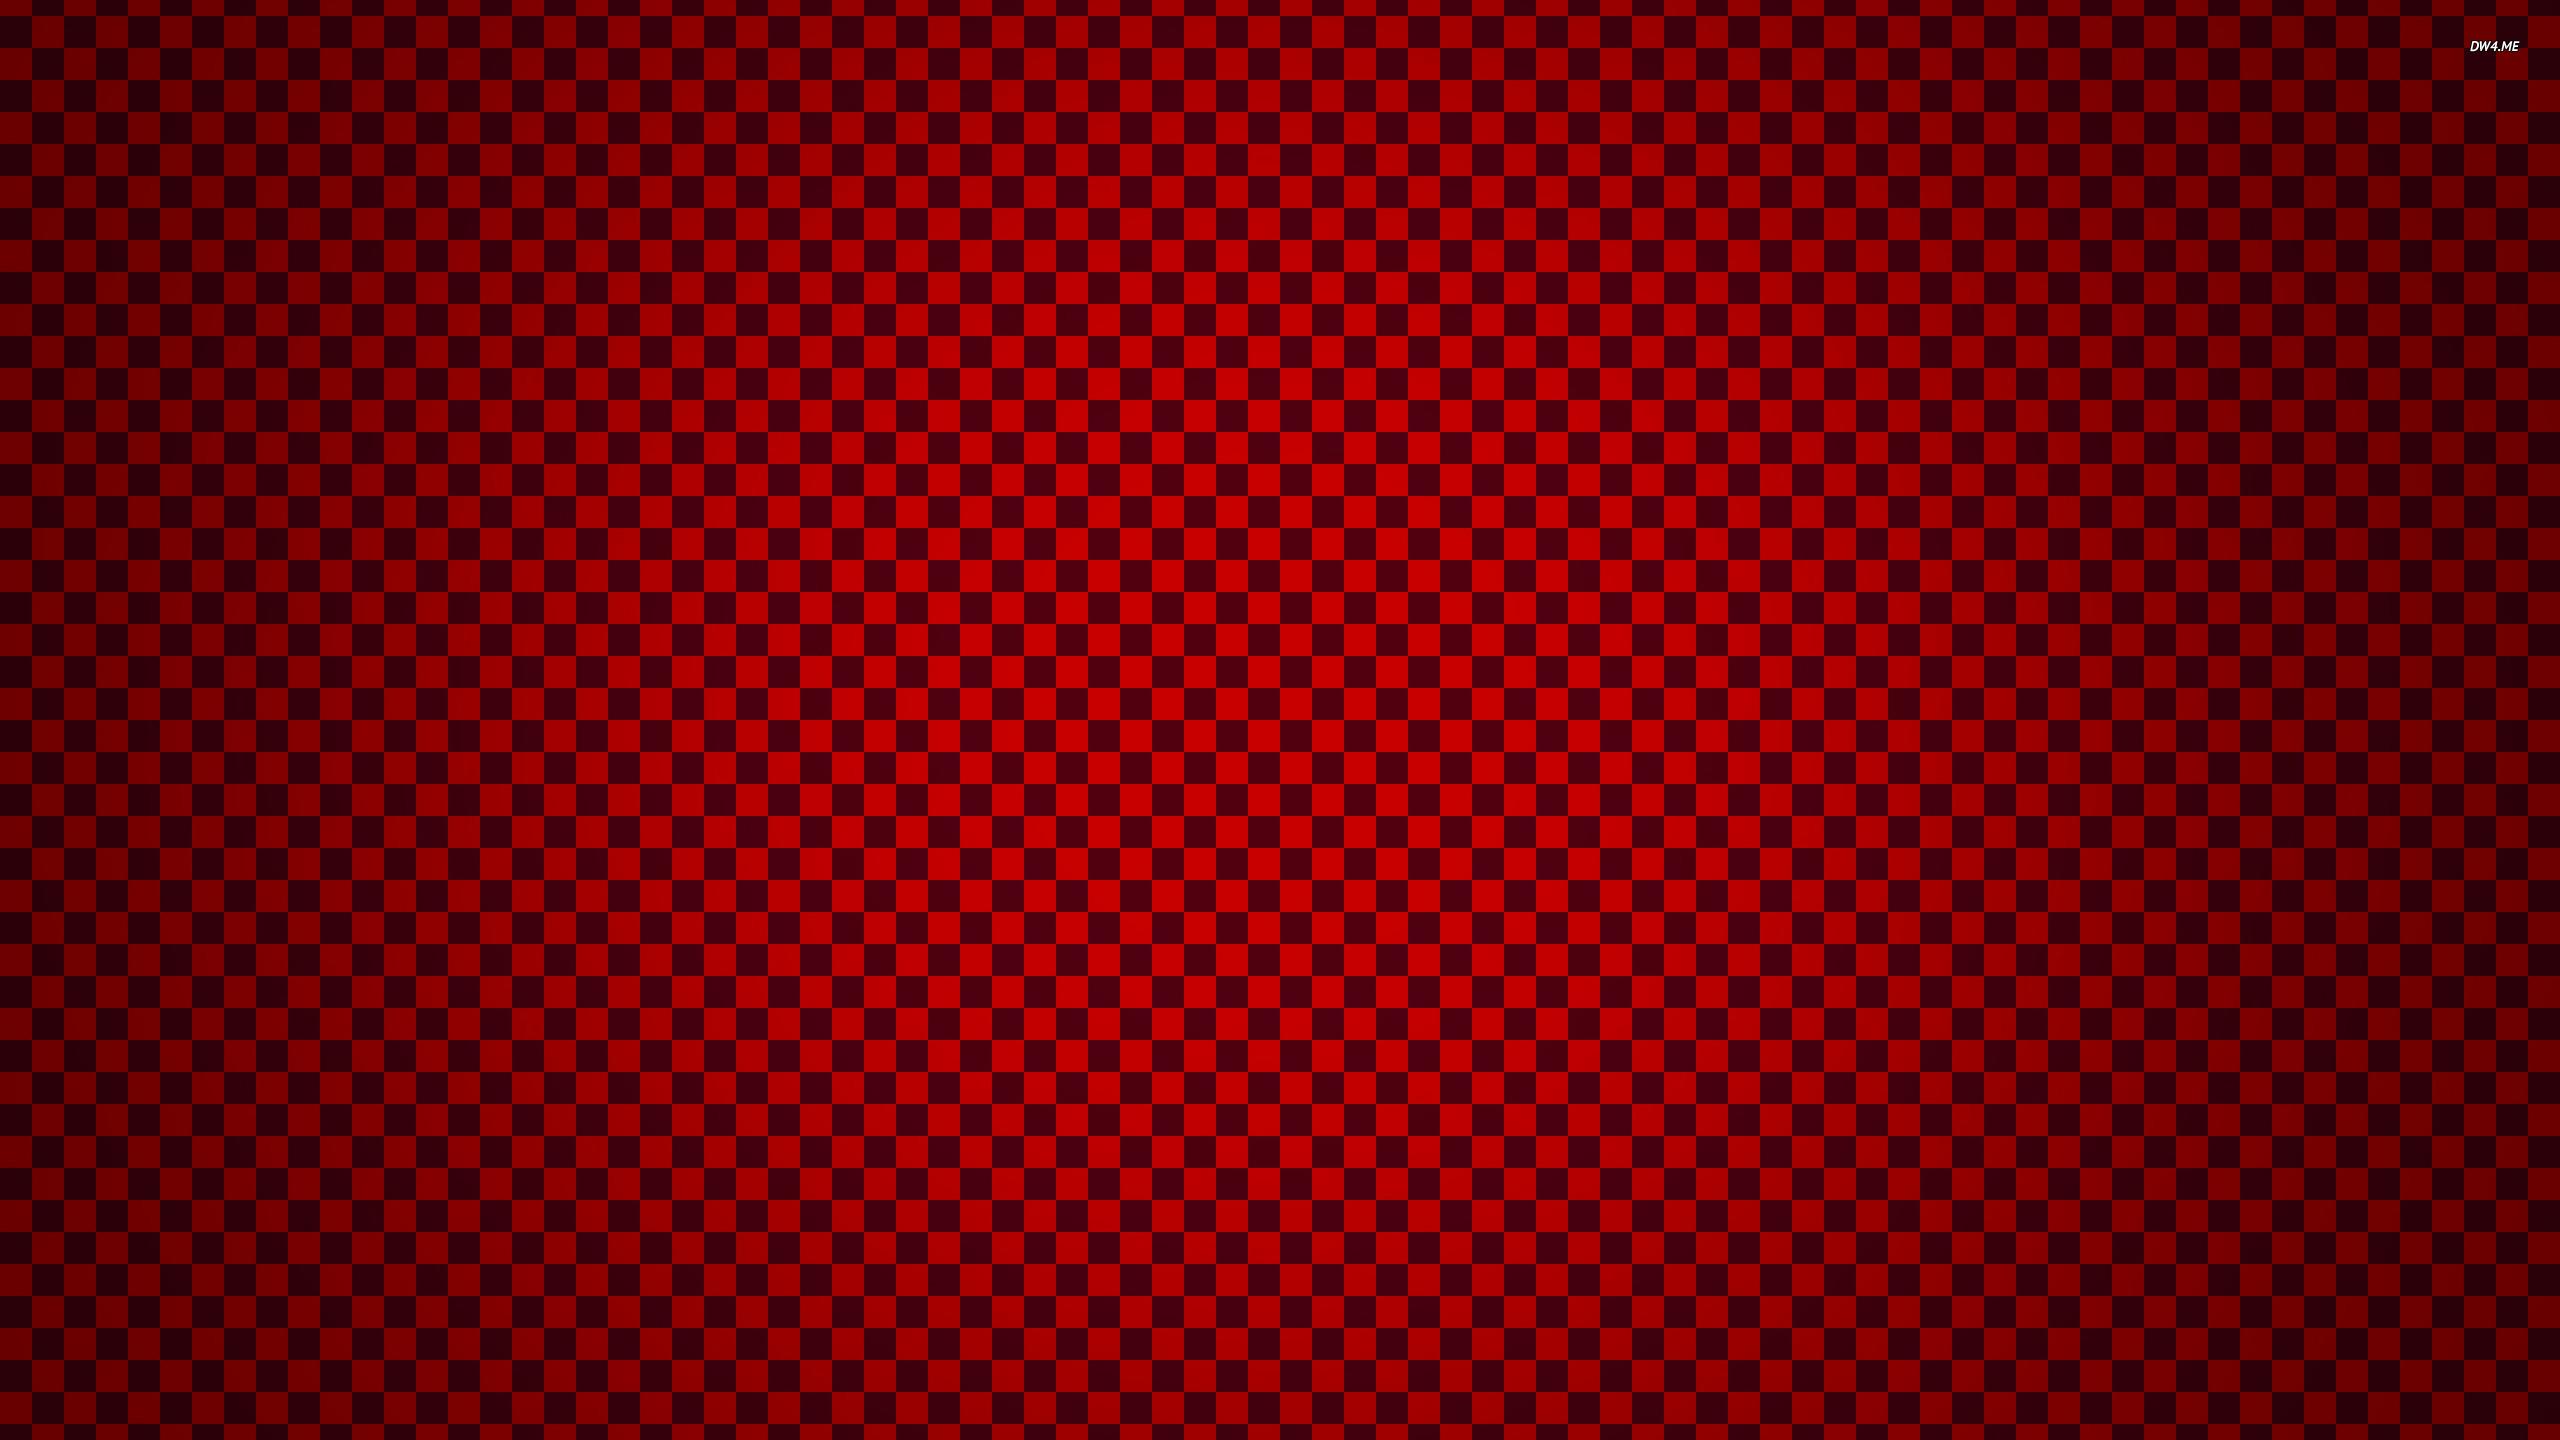 Red checkered wallpaper wallpapersafari for Red check wallpaper